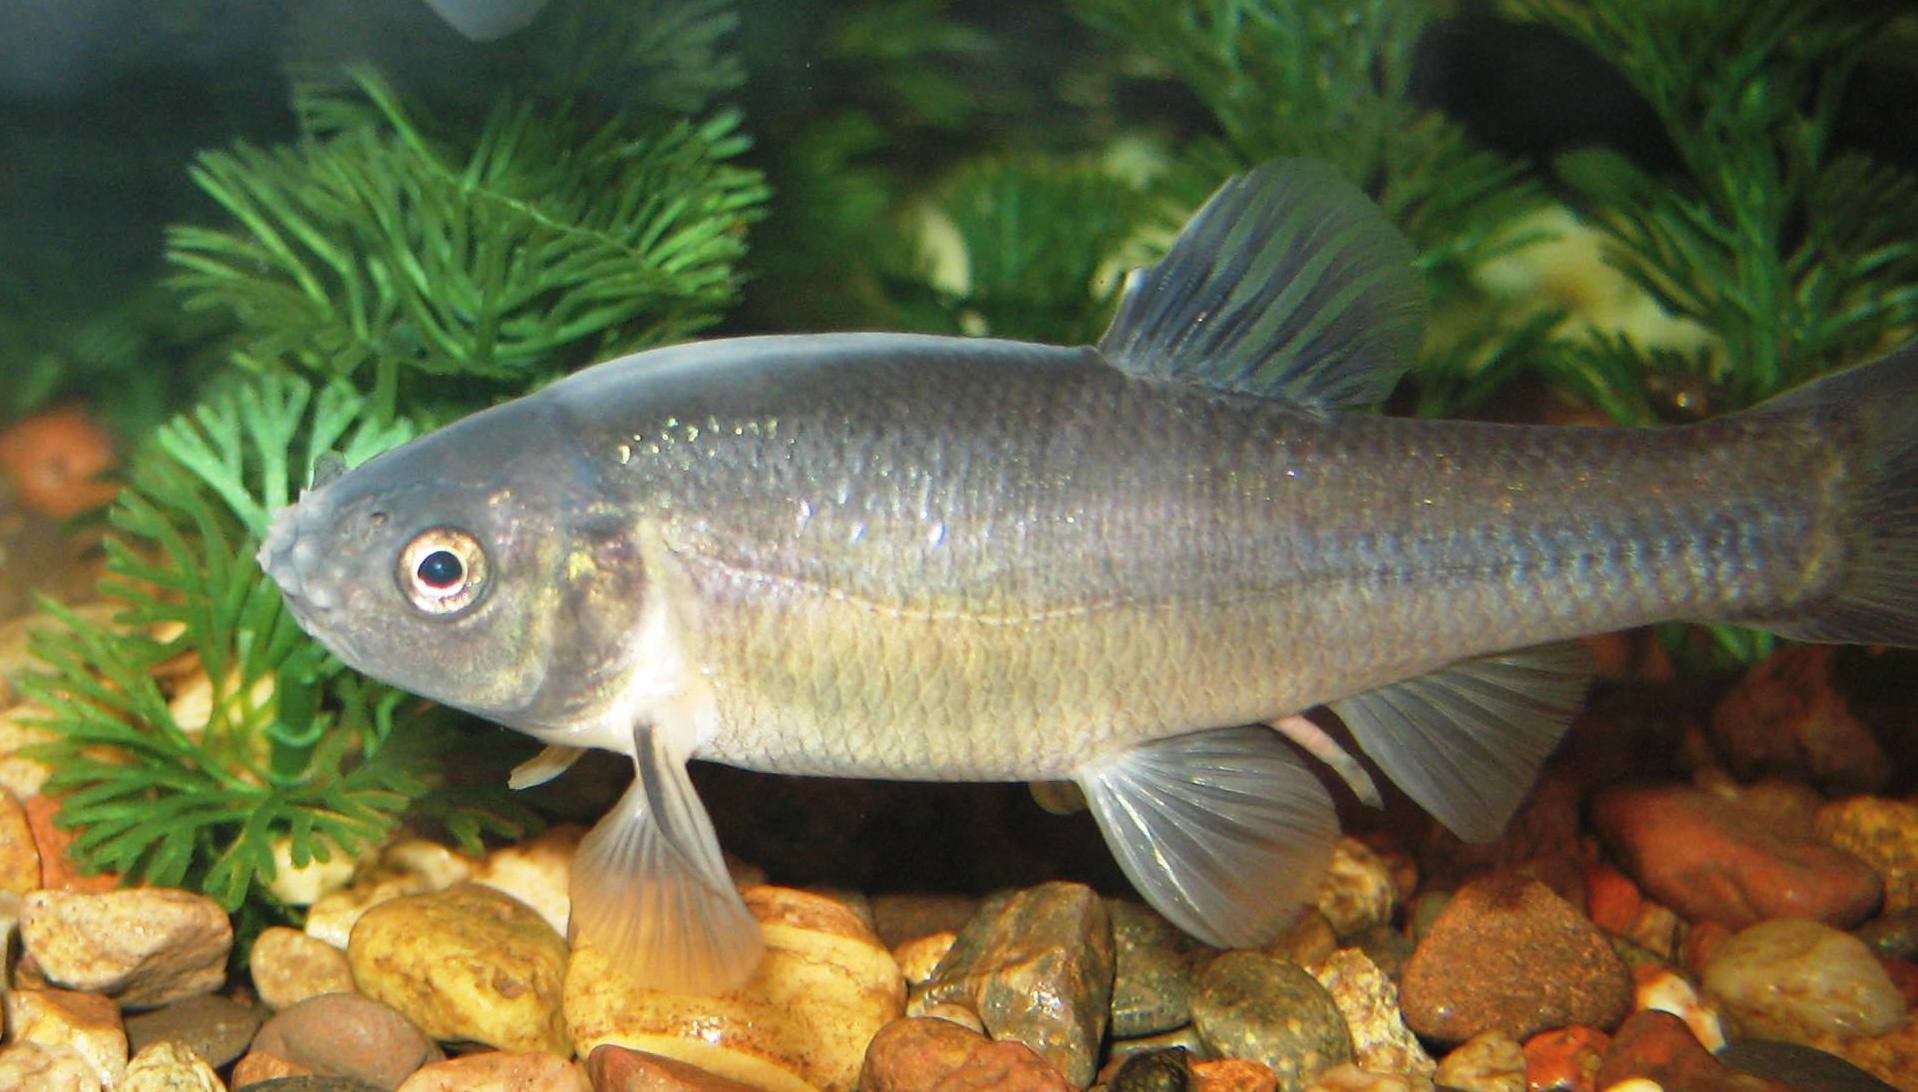 File:Fathead Minnow - Breeding Male.JPG - Wikimedia Commons